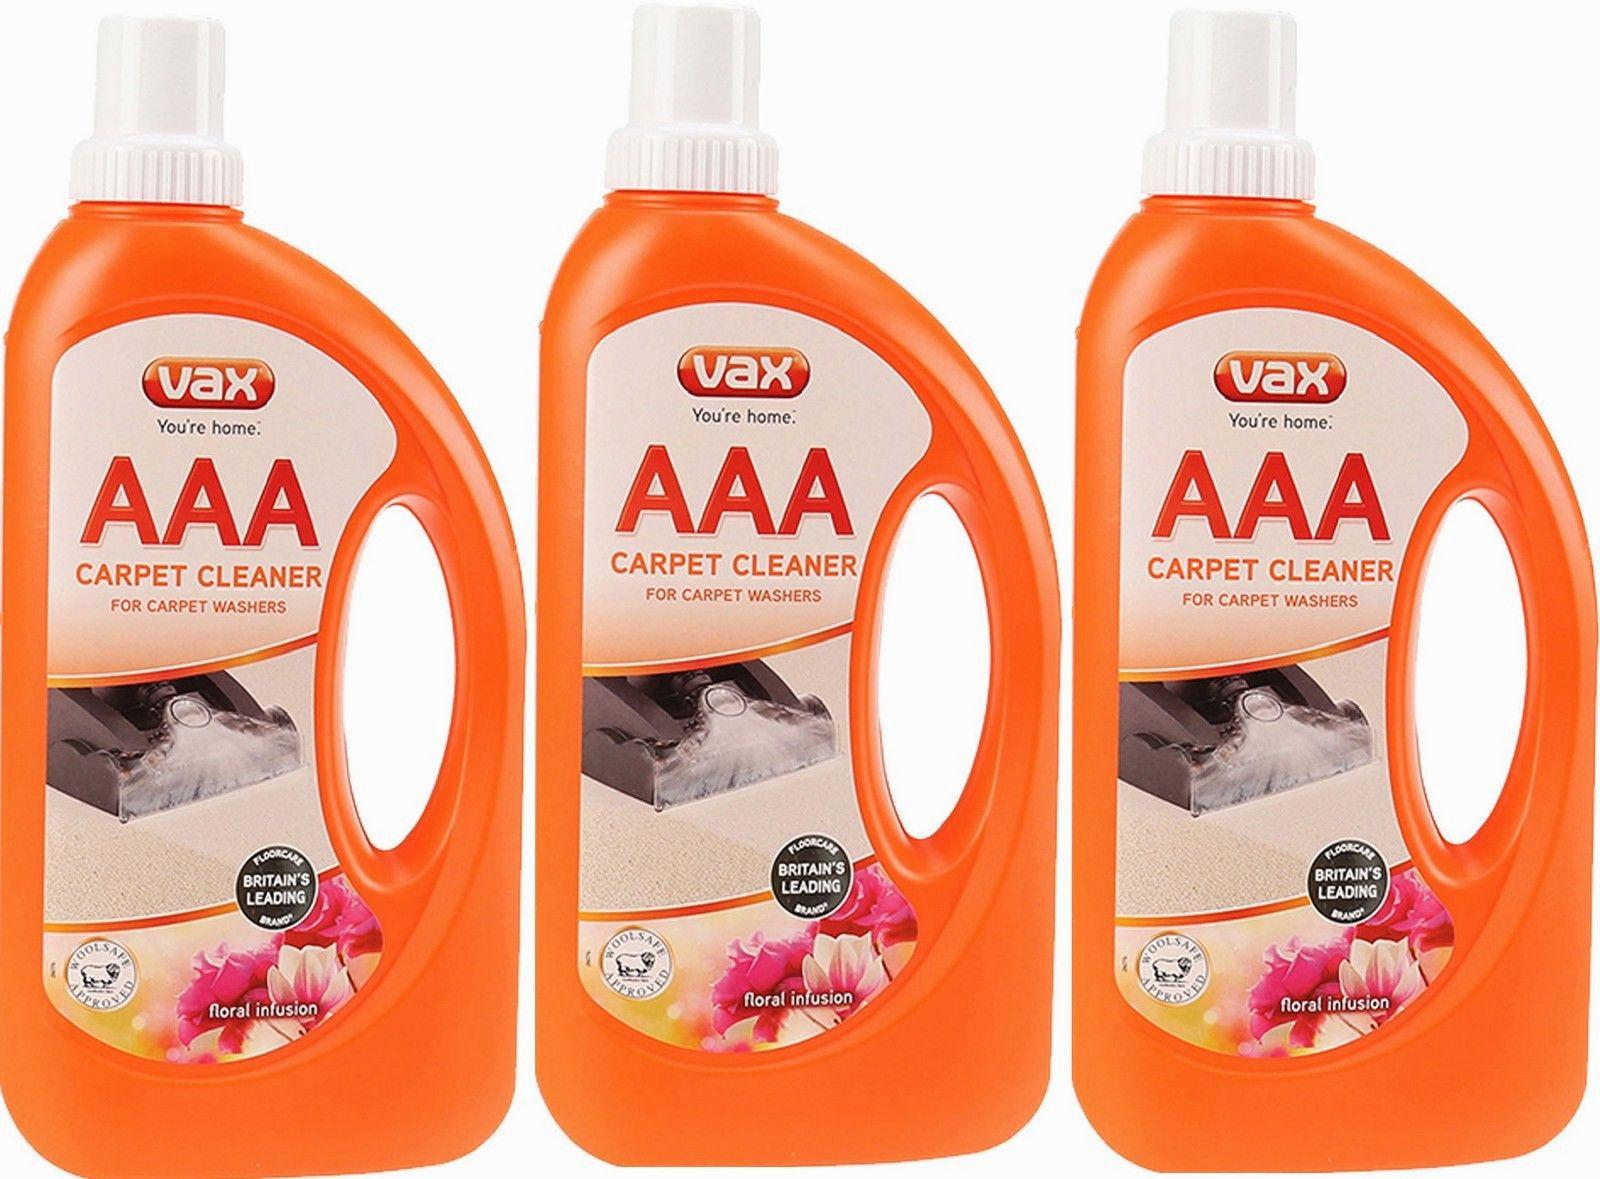 3 x vax aaa improved carpet formula cleaning solution shampoo 750ml ebay - Vax carpet shampoo stockists ...